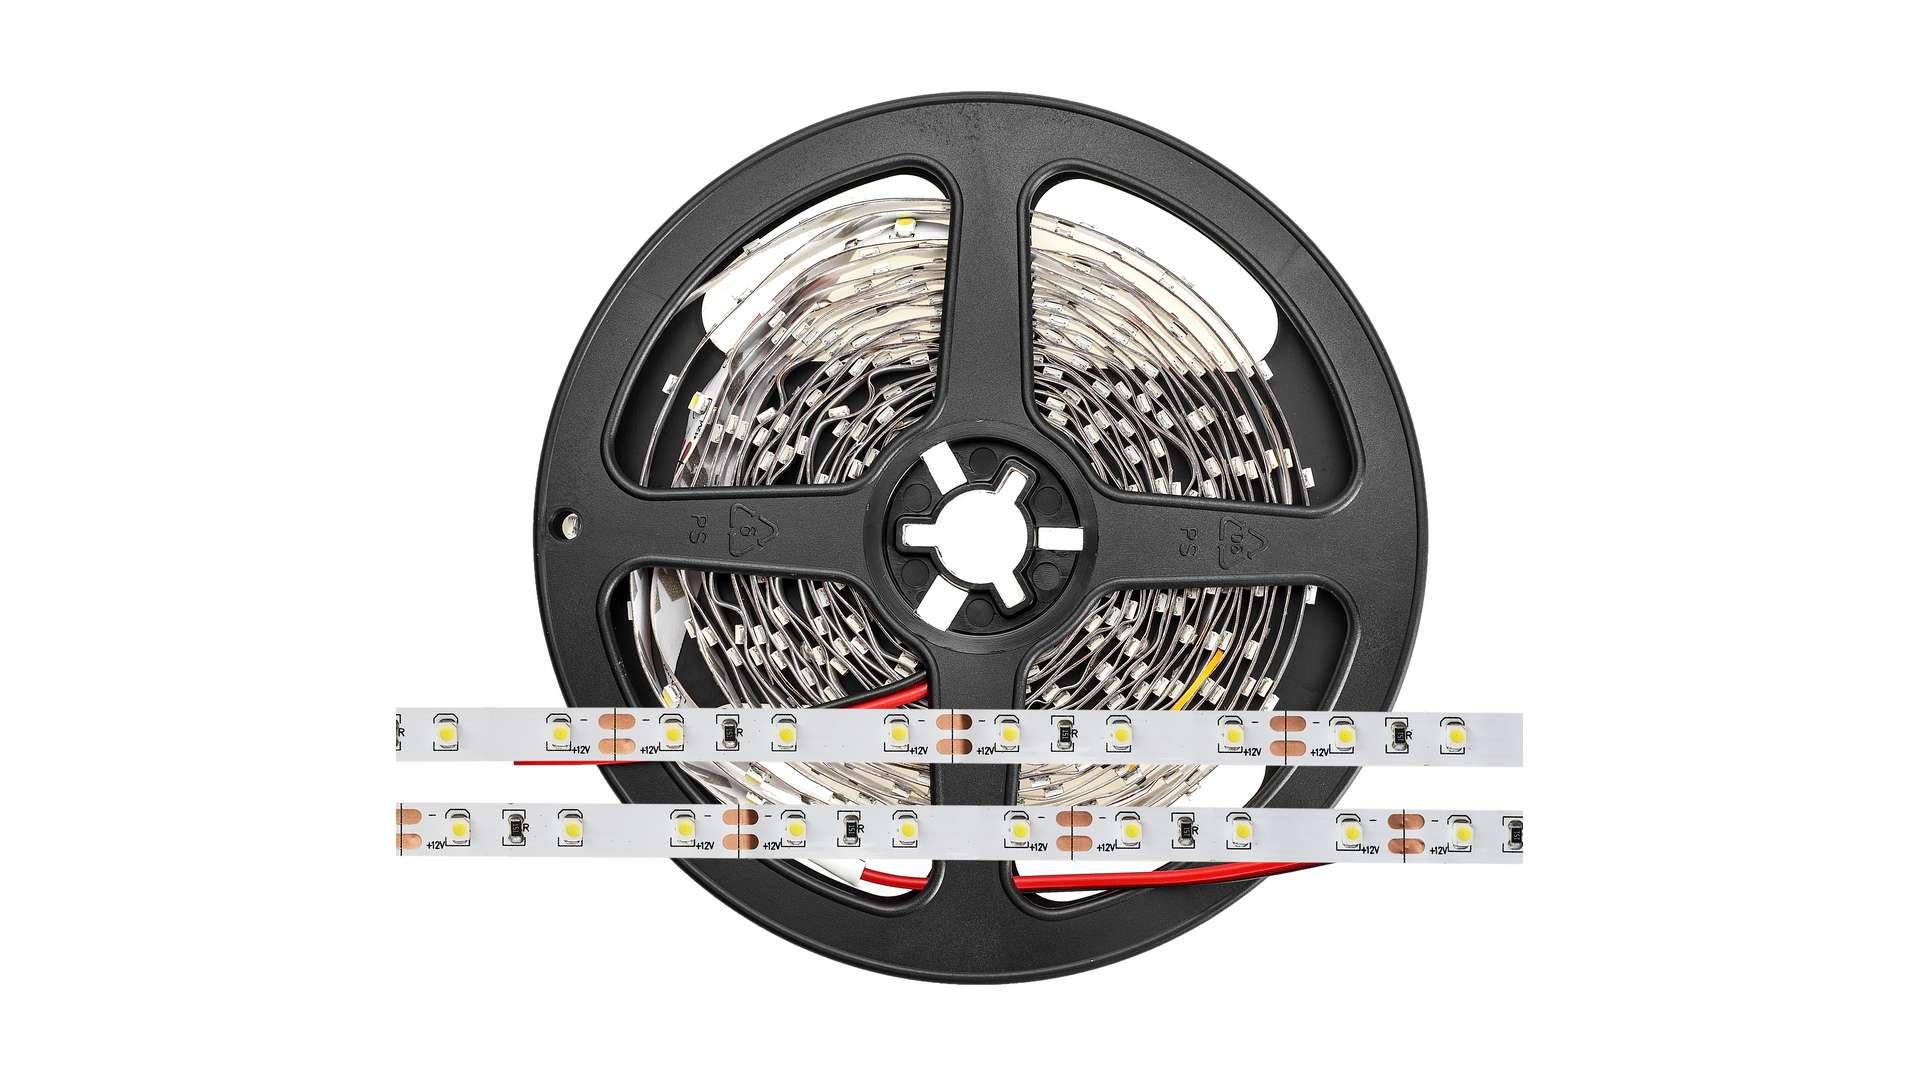 Taśma 300 LED 60 LED/m 2835 SMD, Biała Ciepła